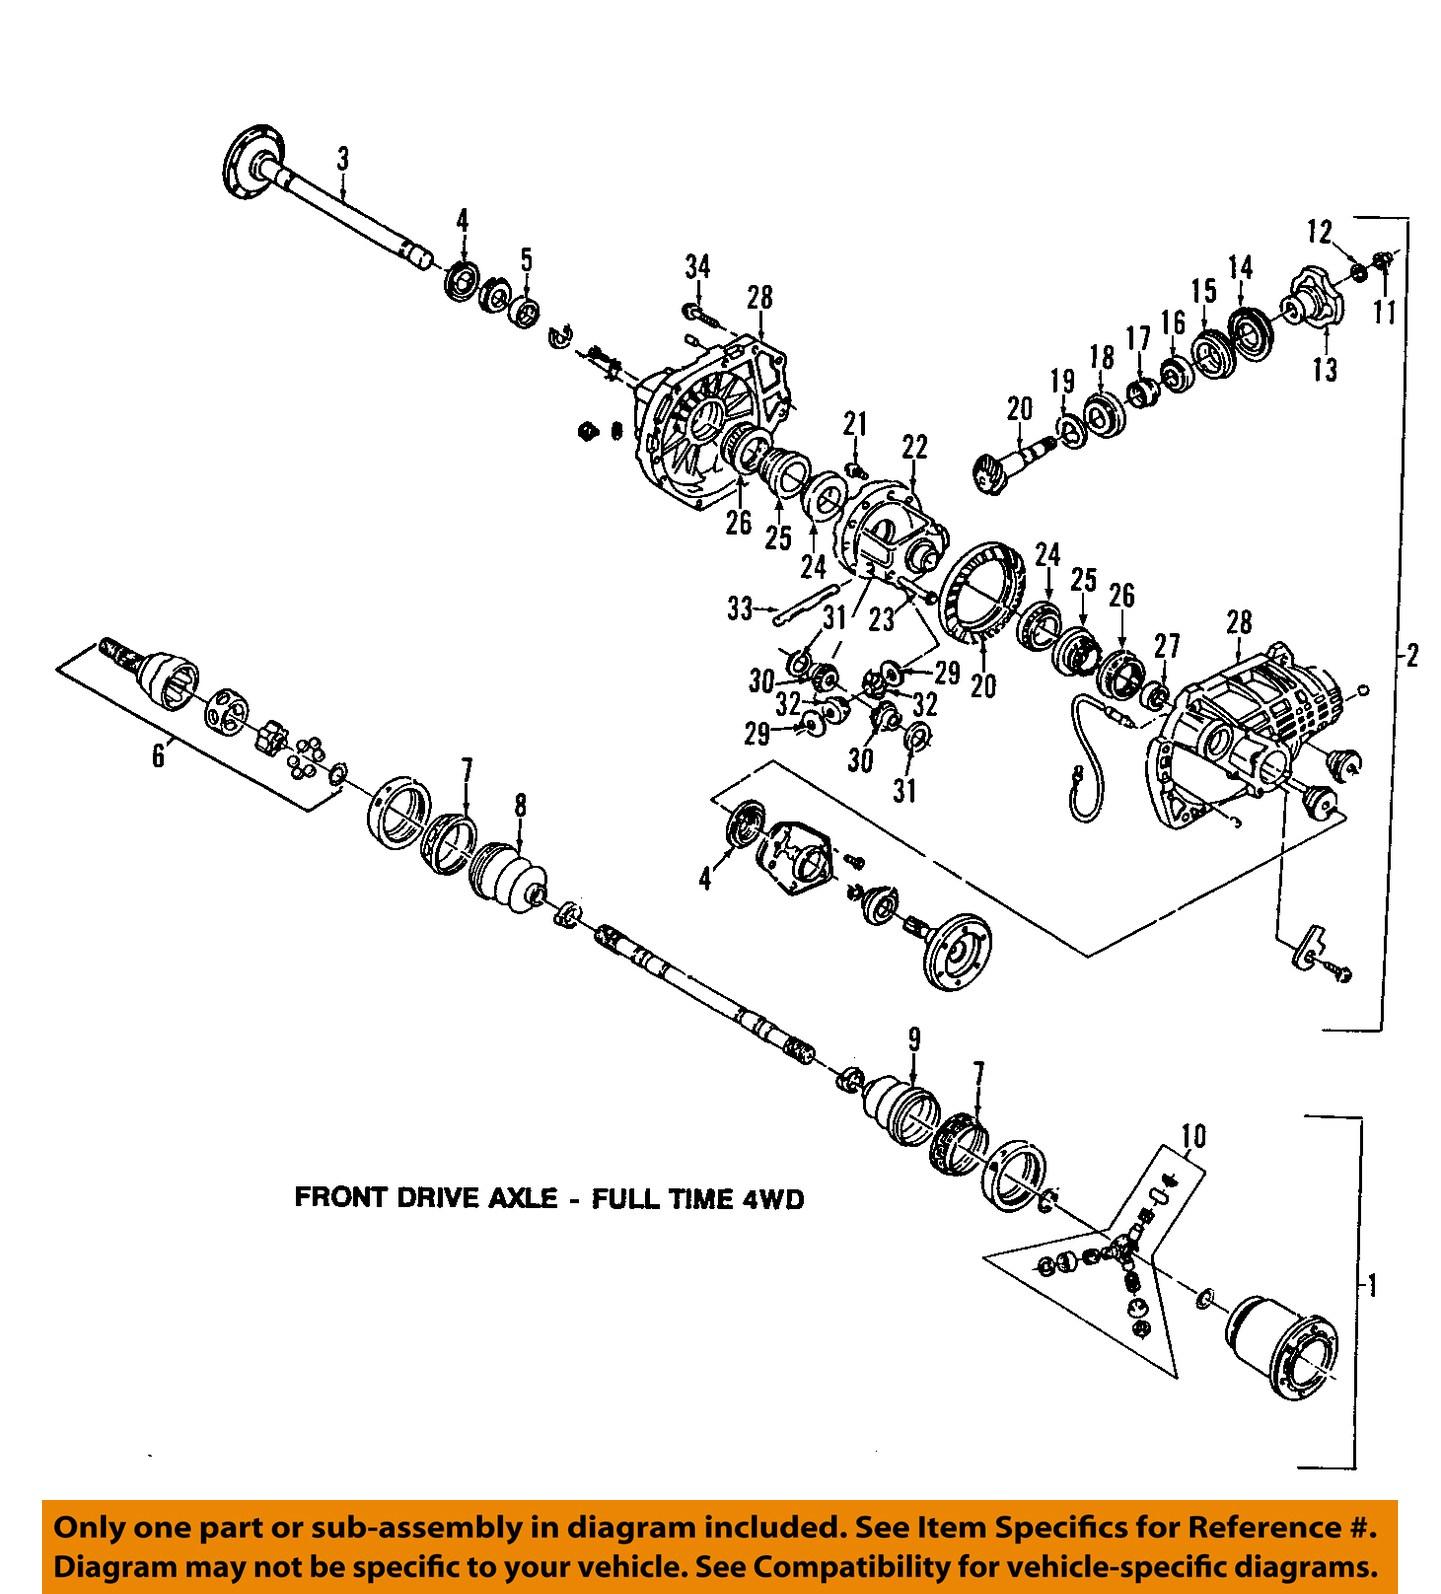 DIAGRAM] Dong Fang Bobber Wiring Diagram FULL Version HD Quality Wiring  Diagram - SUSPENSIONARMOR.LIONSICILIA.ITlionsicilia.it